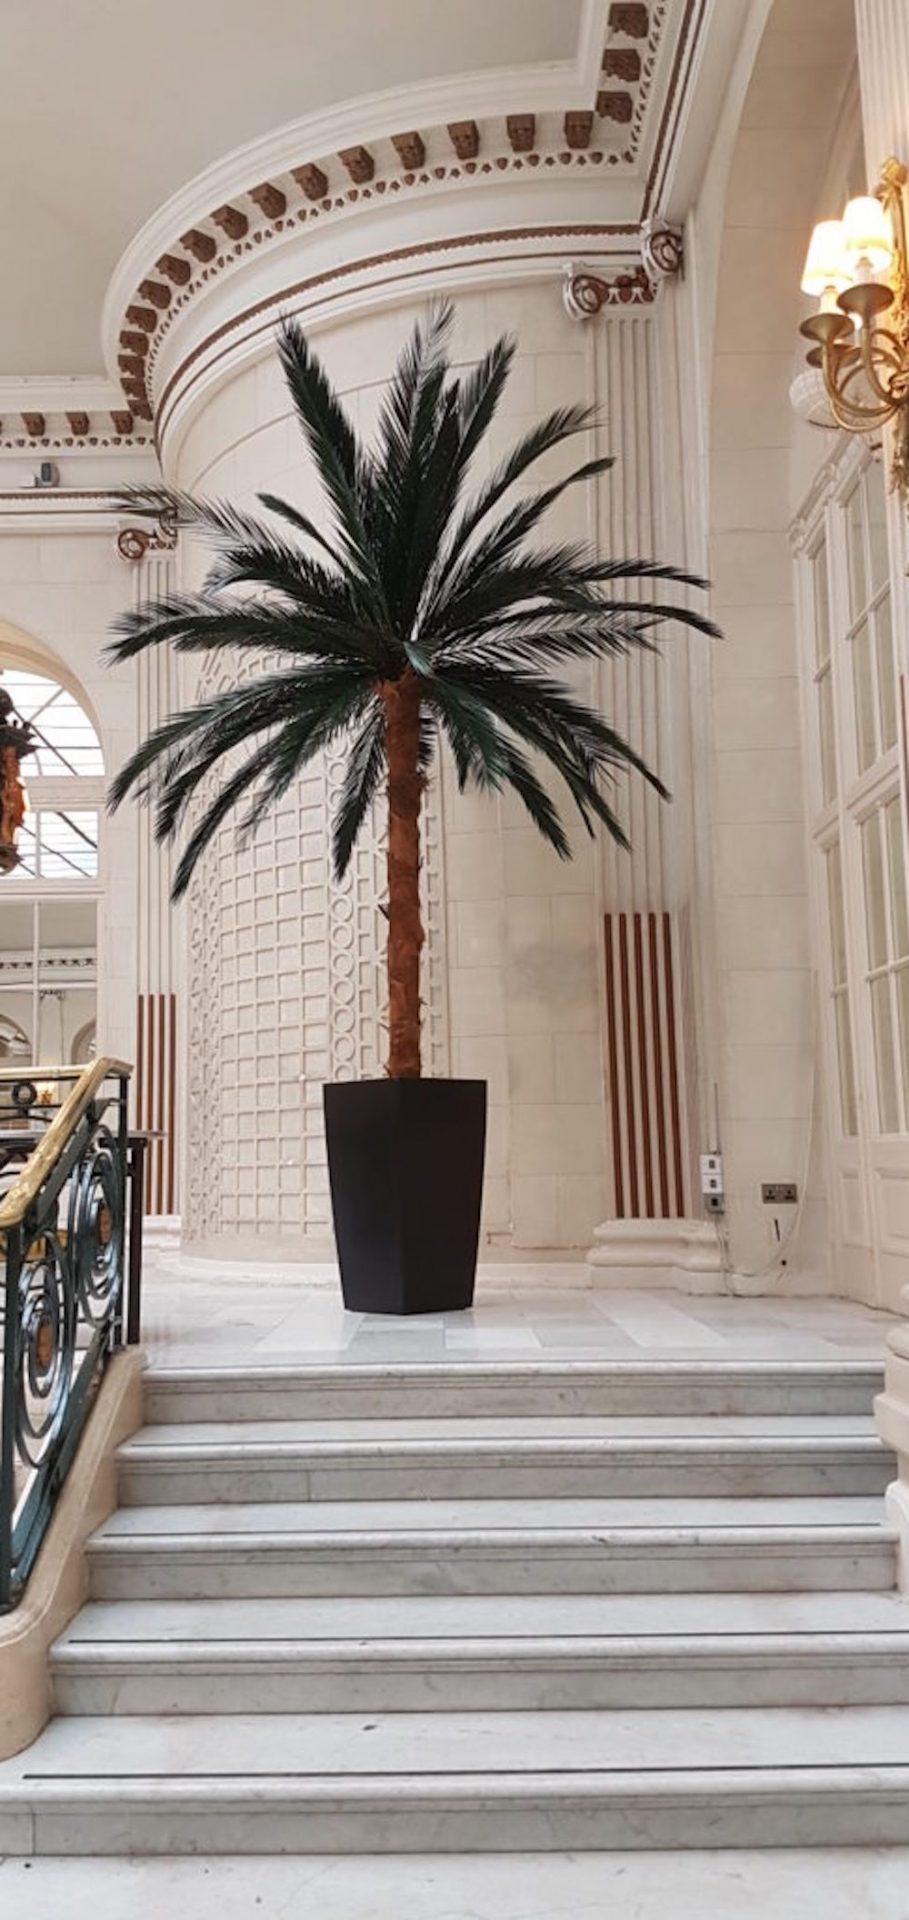 Image credit: Leaflike/Waldorf Hilton Palm Court